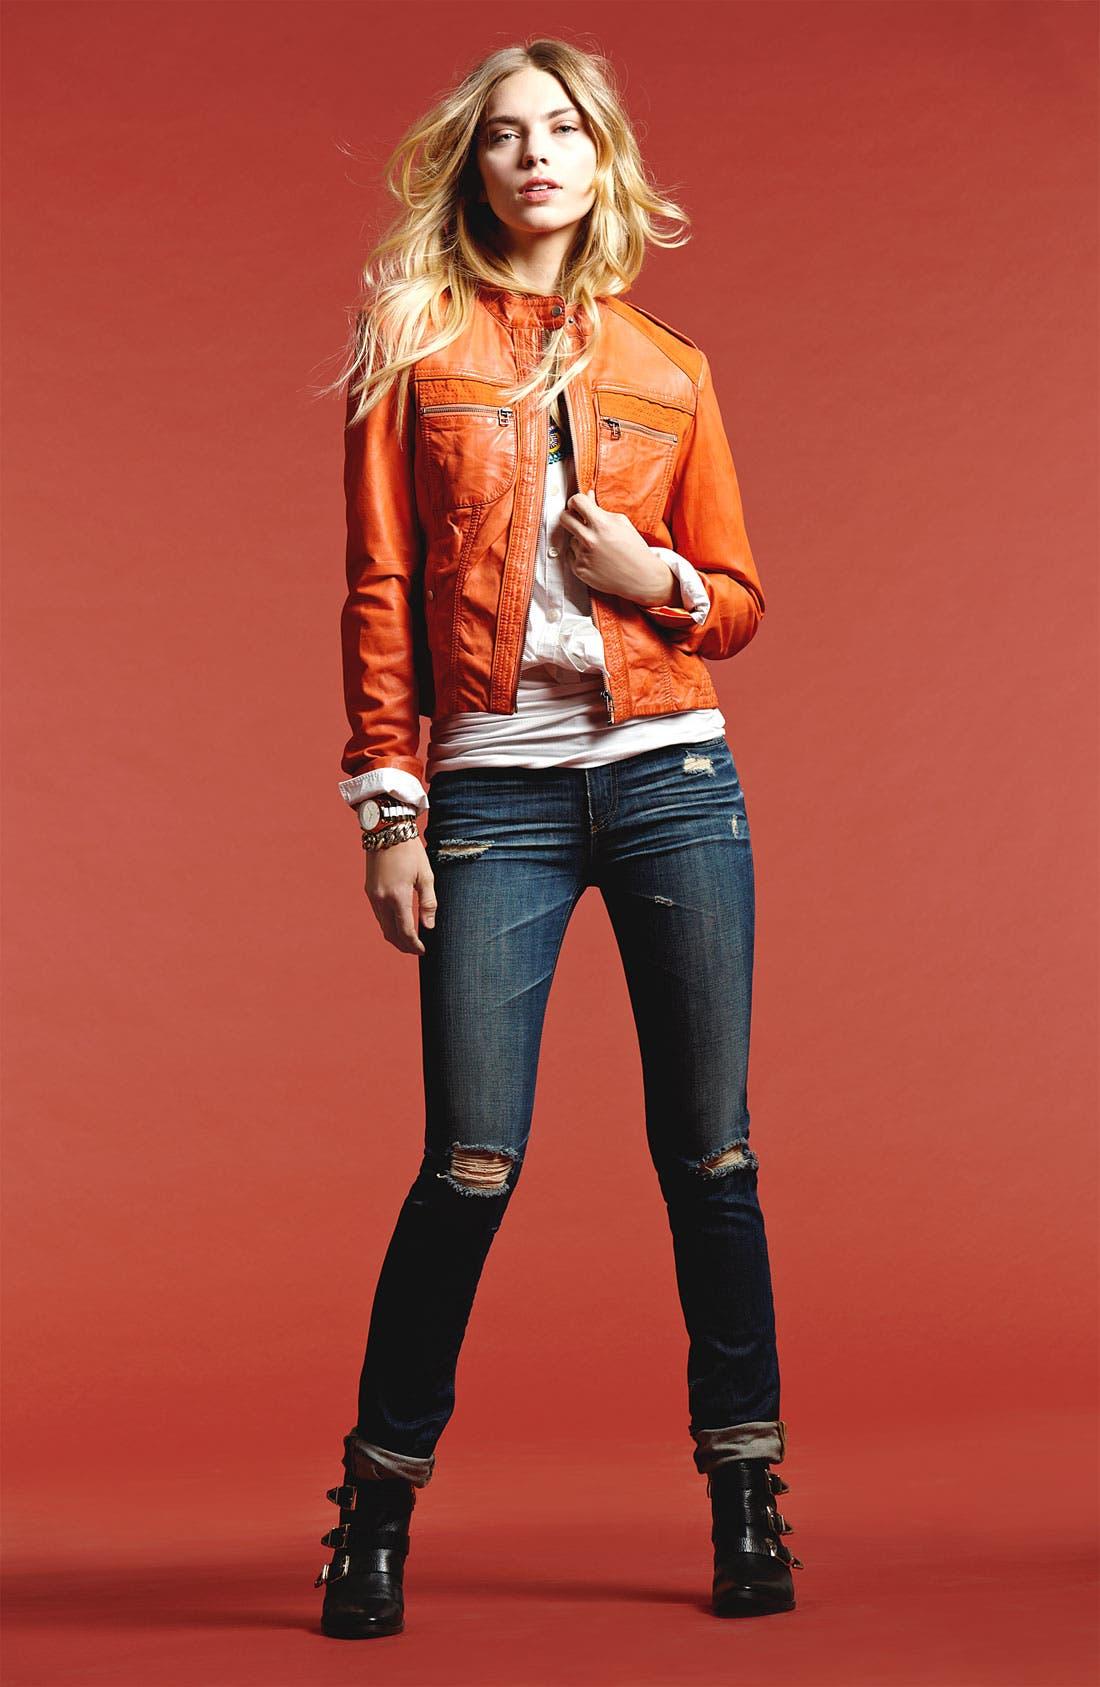 Alternate Image 1 Selected - Bernardo Jacket, Caslon® Shirt, Stem Tank & AG Jeans